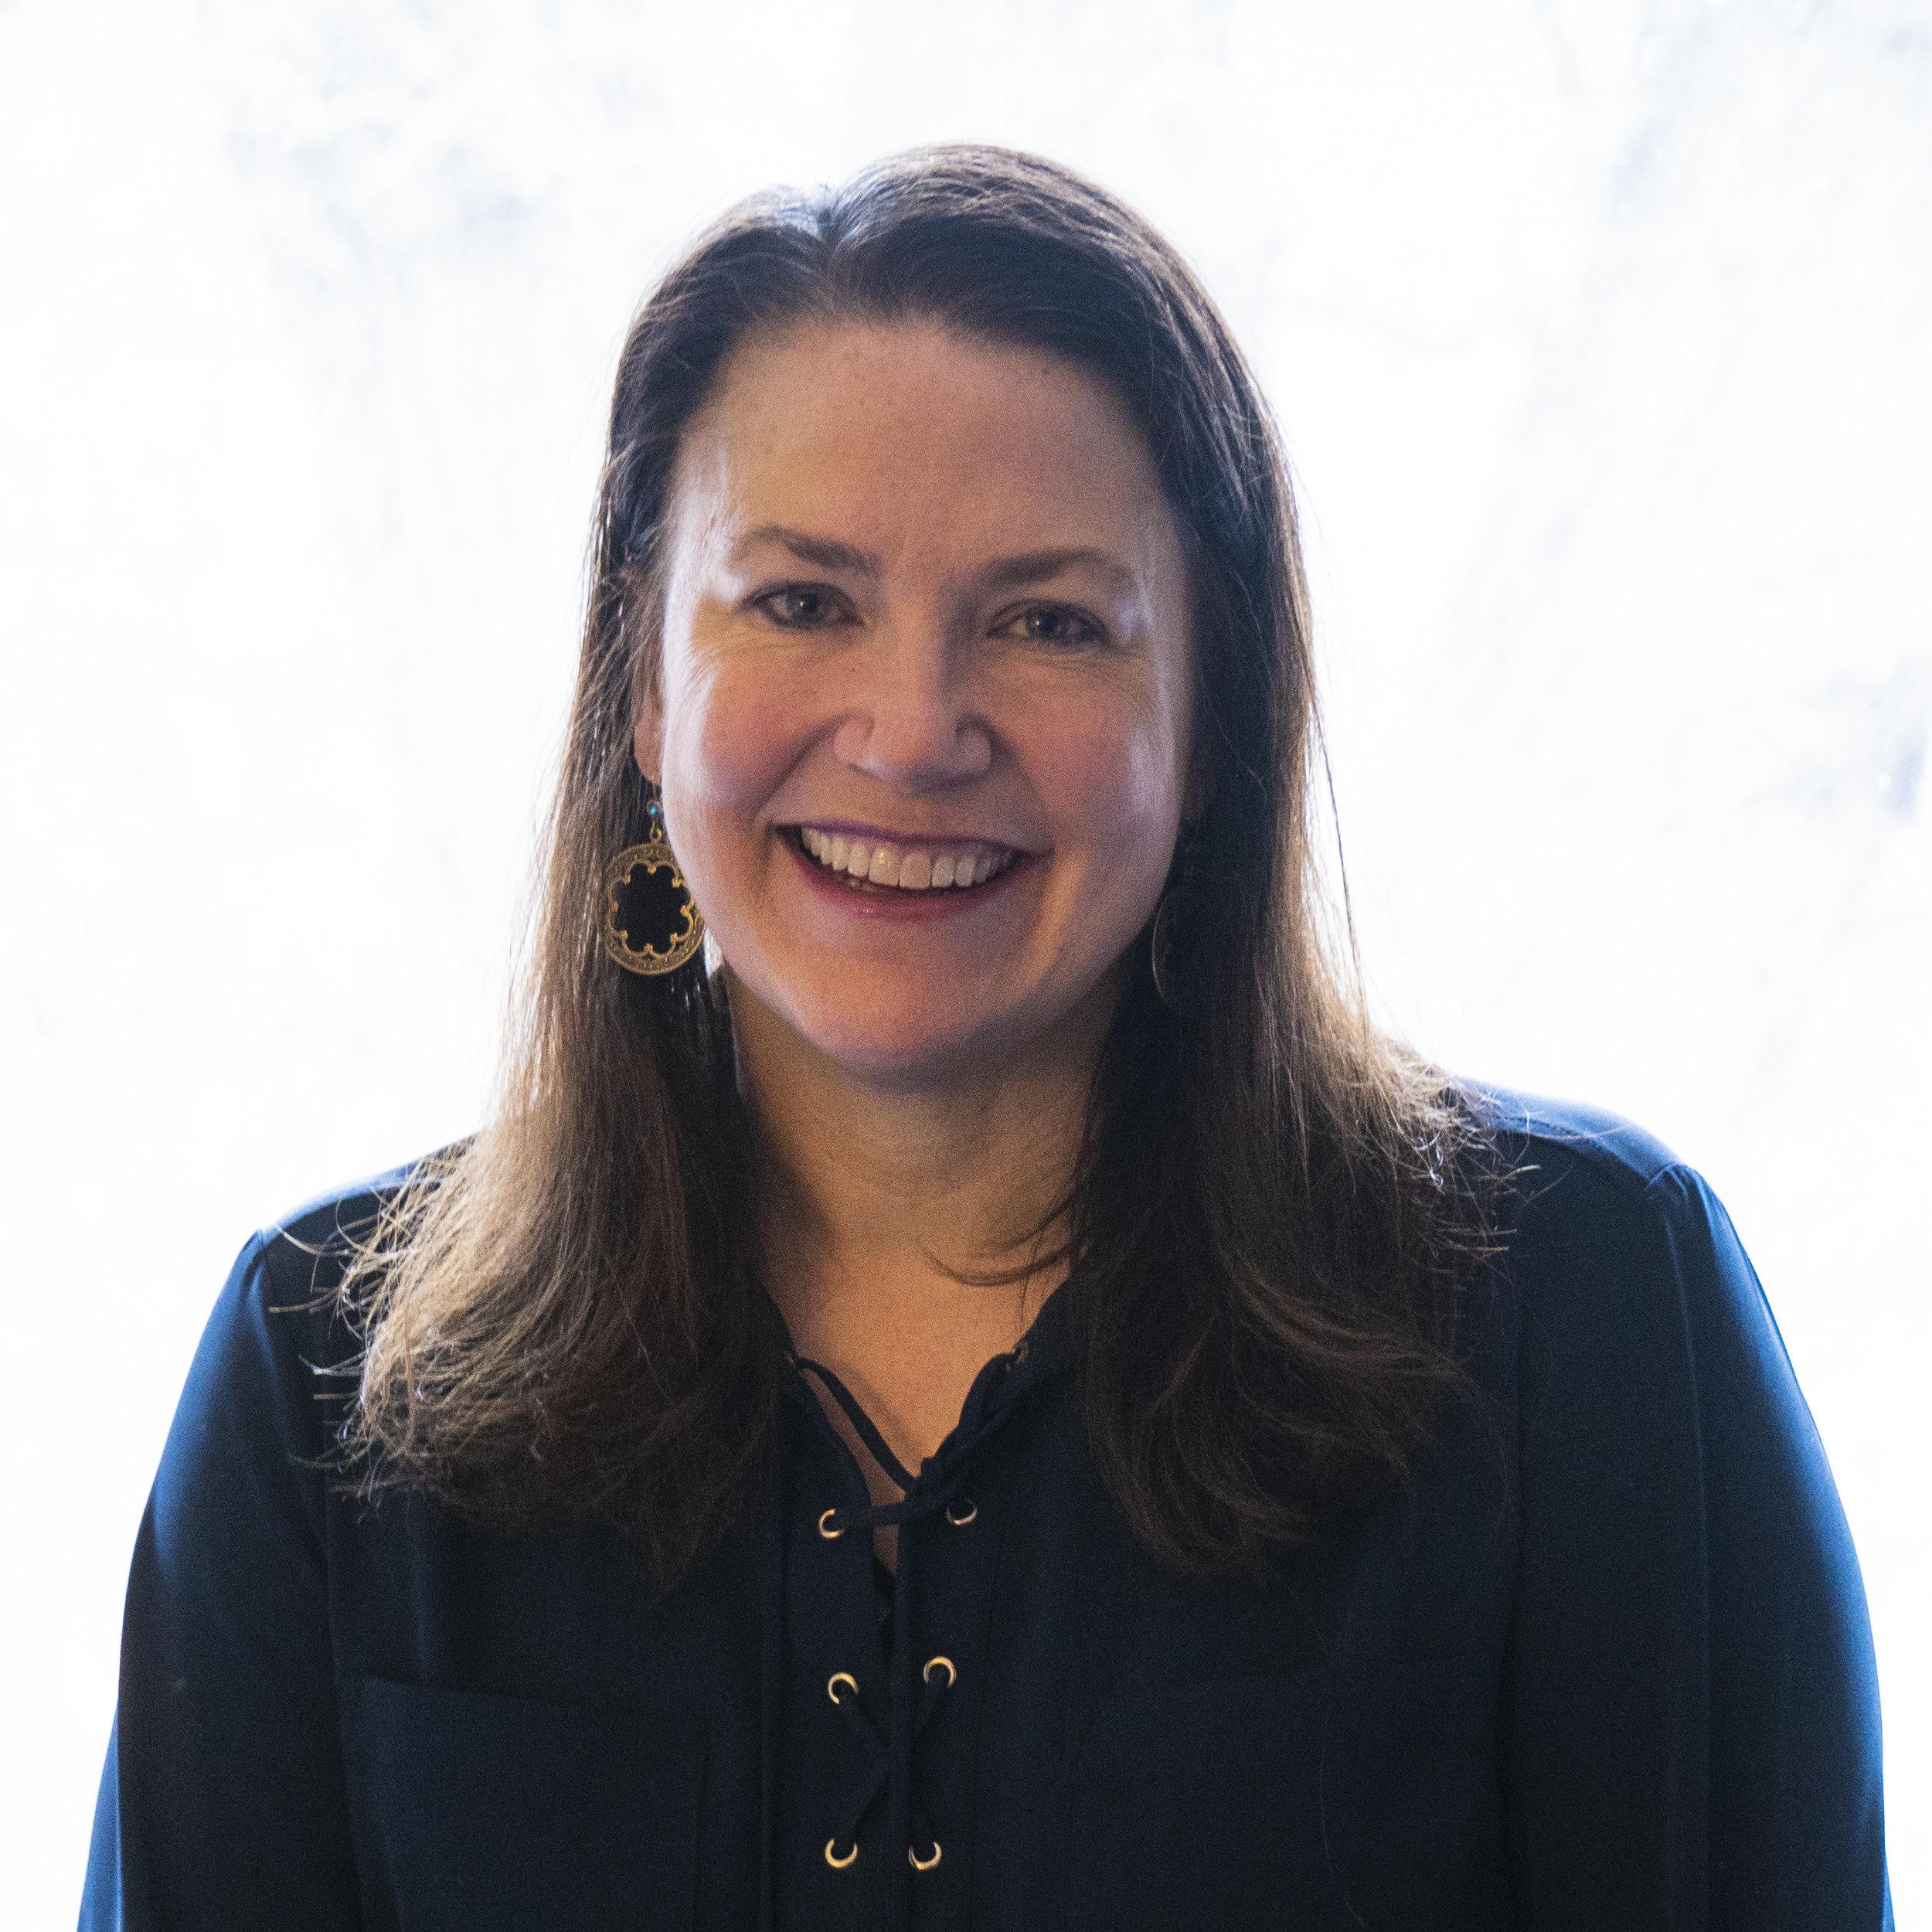 Carol Allison Jack - candidate for 2019 District 90 School Board